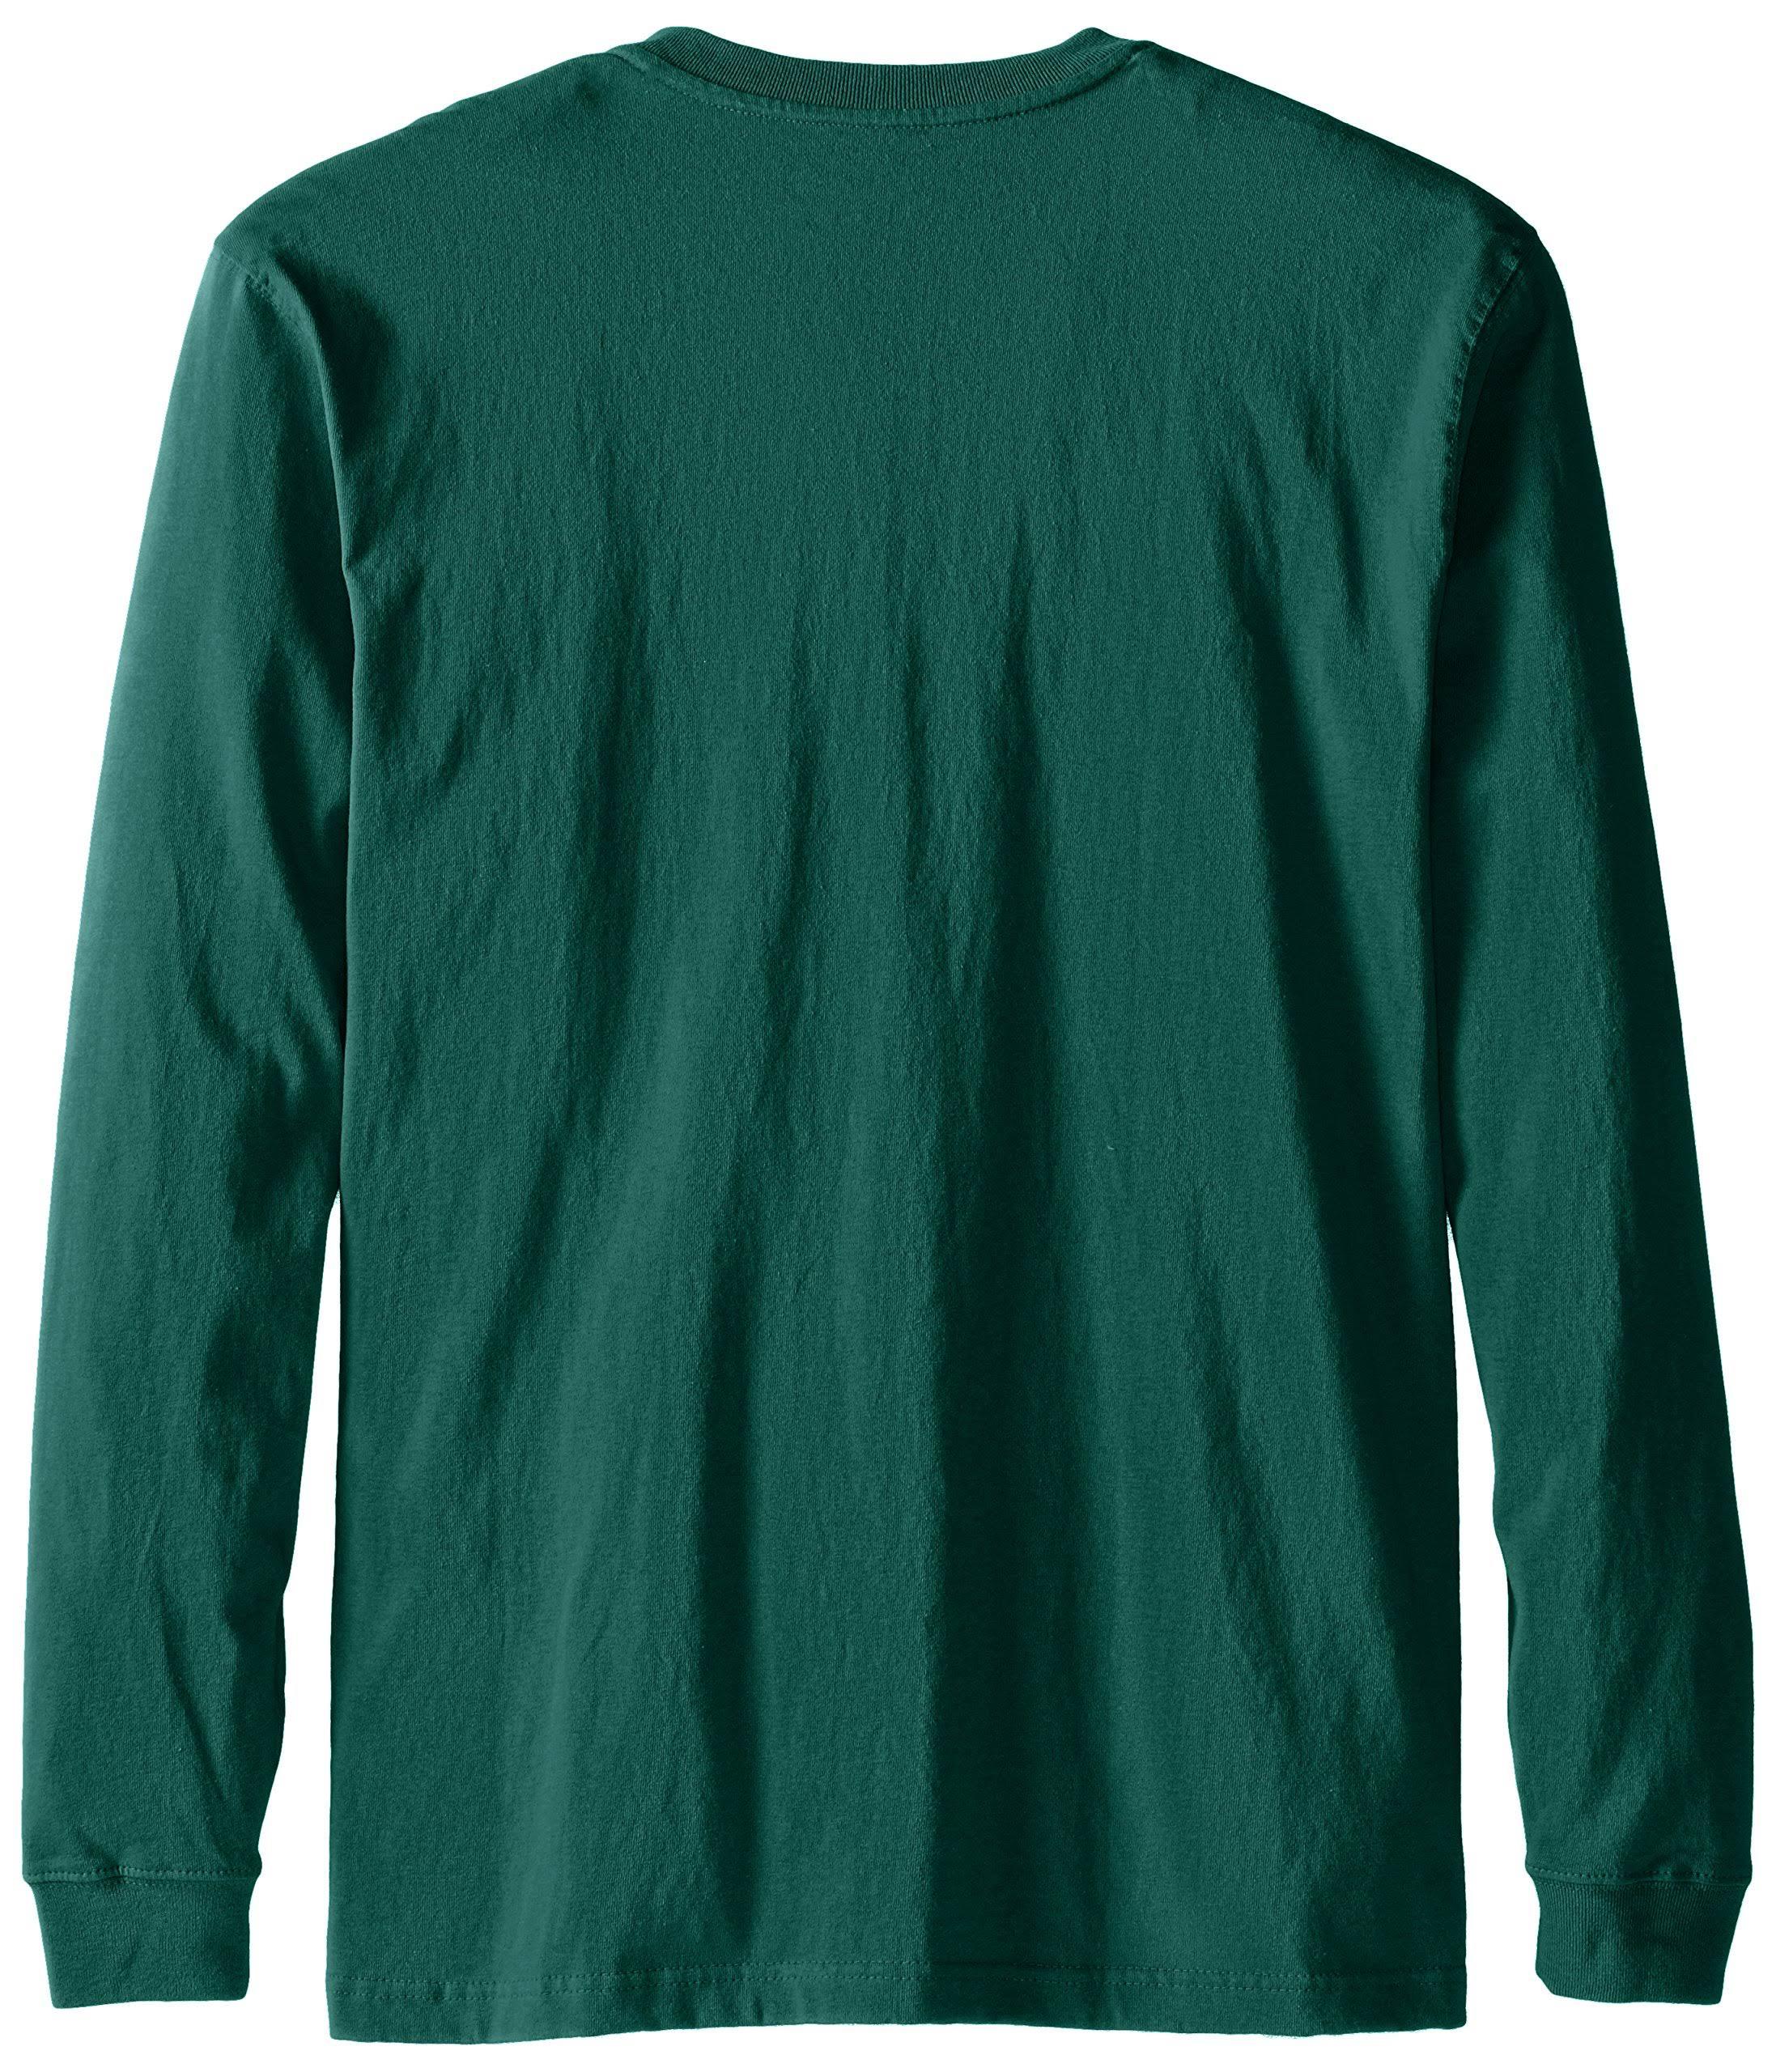 Carhartt K128 Green Workwear Tall Manga Bolsillo Henley De Larga Xl rPr0BFn